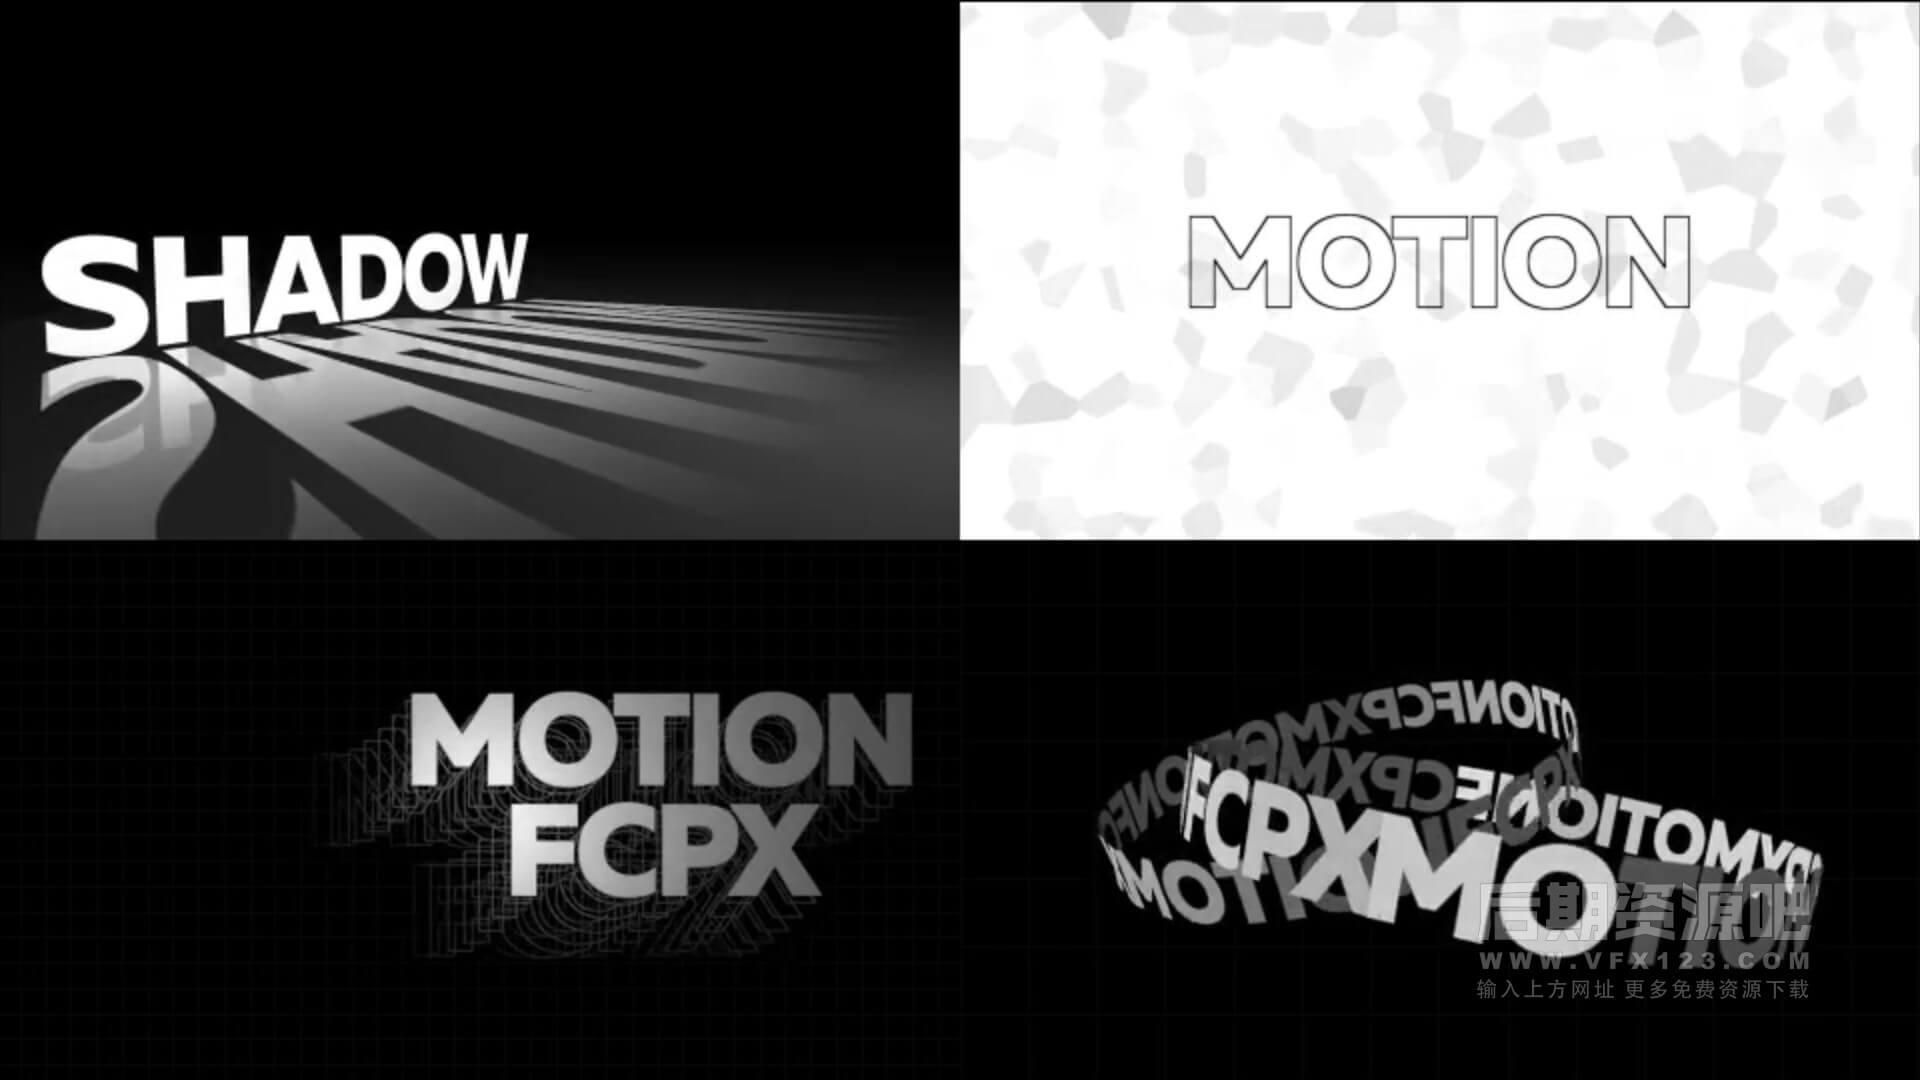 fcpx插件 64组海报标题动画预设 动态排版可改颜色含背景 支持竖屏